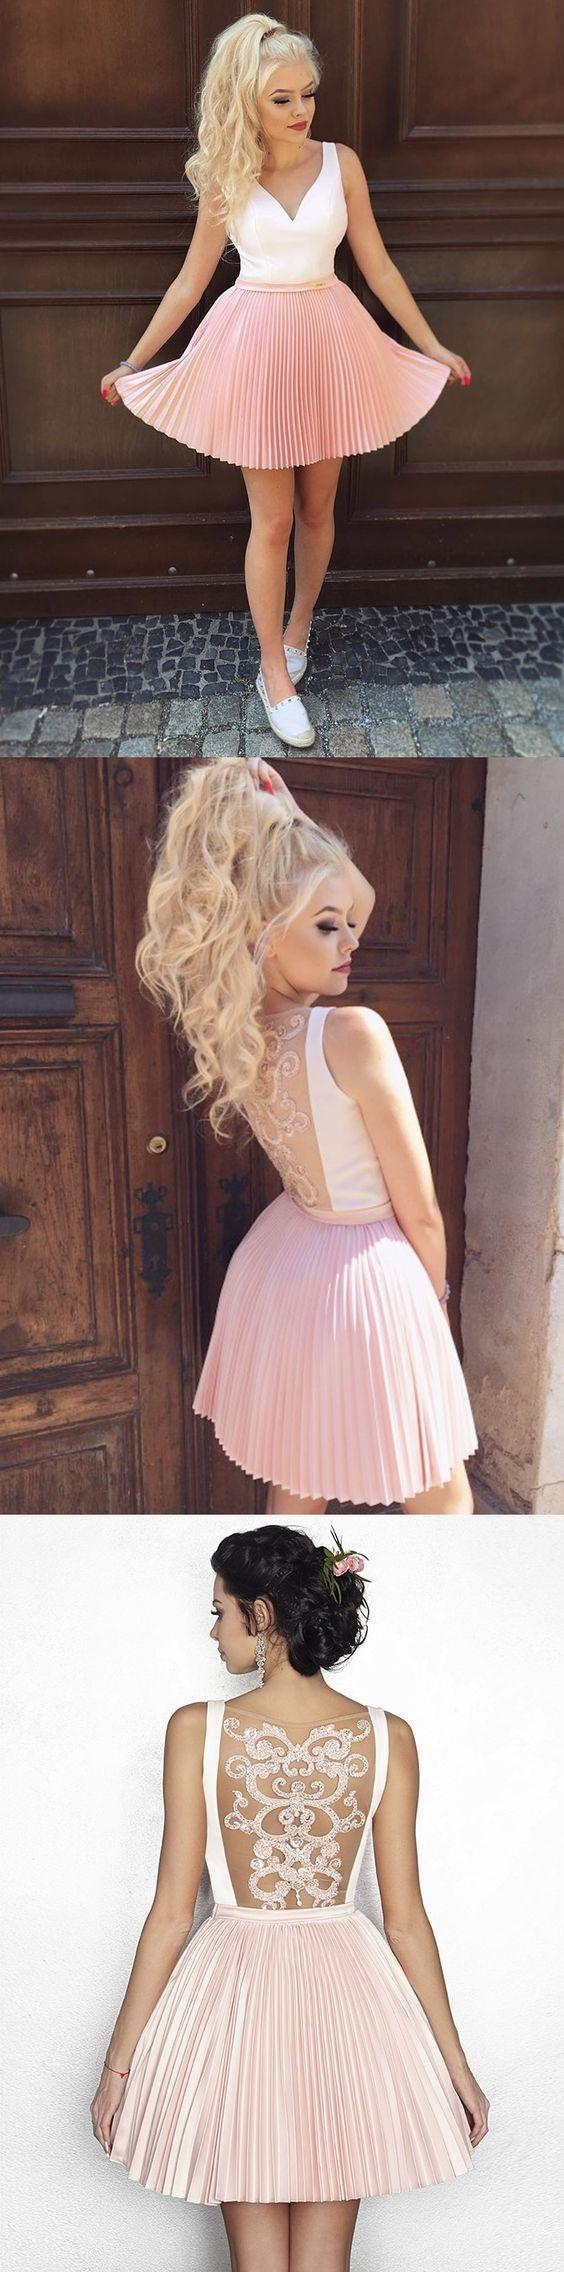 Chic aline pink white homecoming dress cheap cute short prom dress